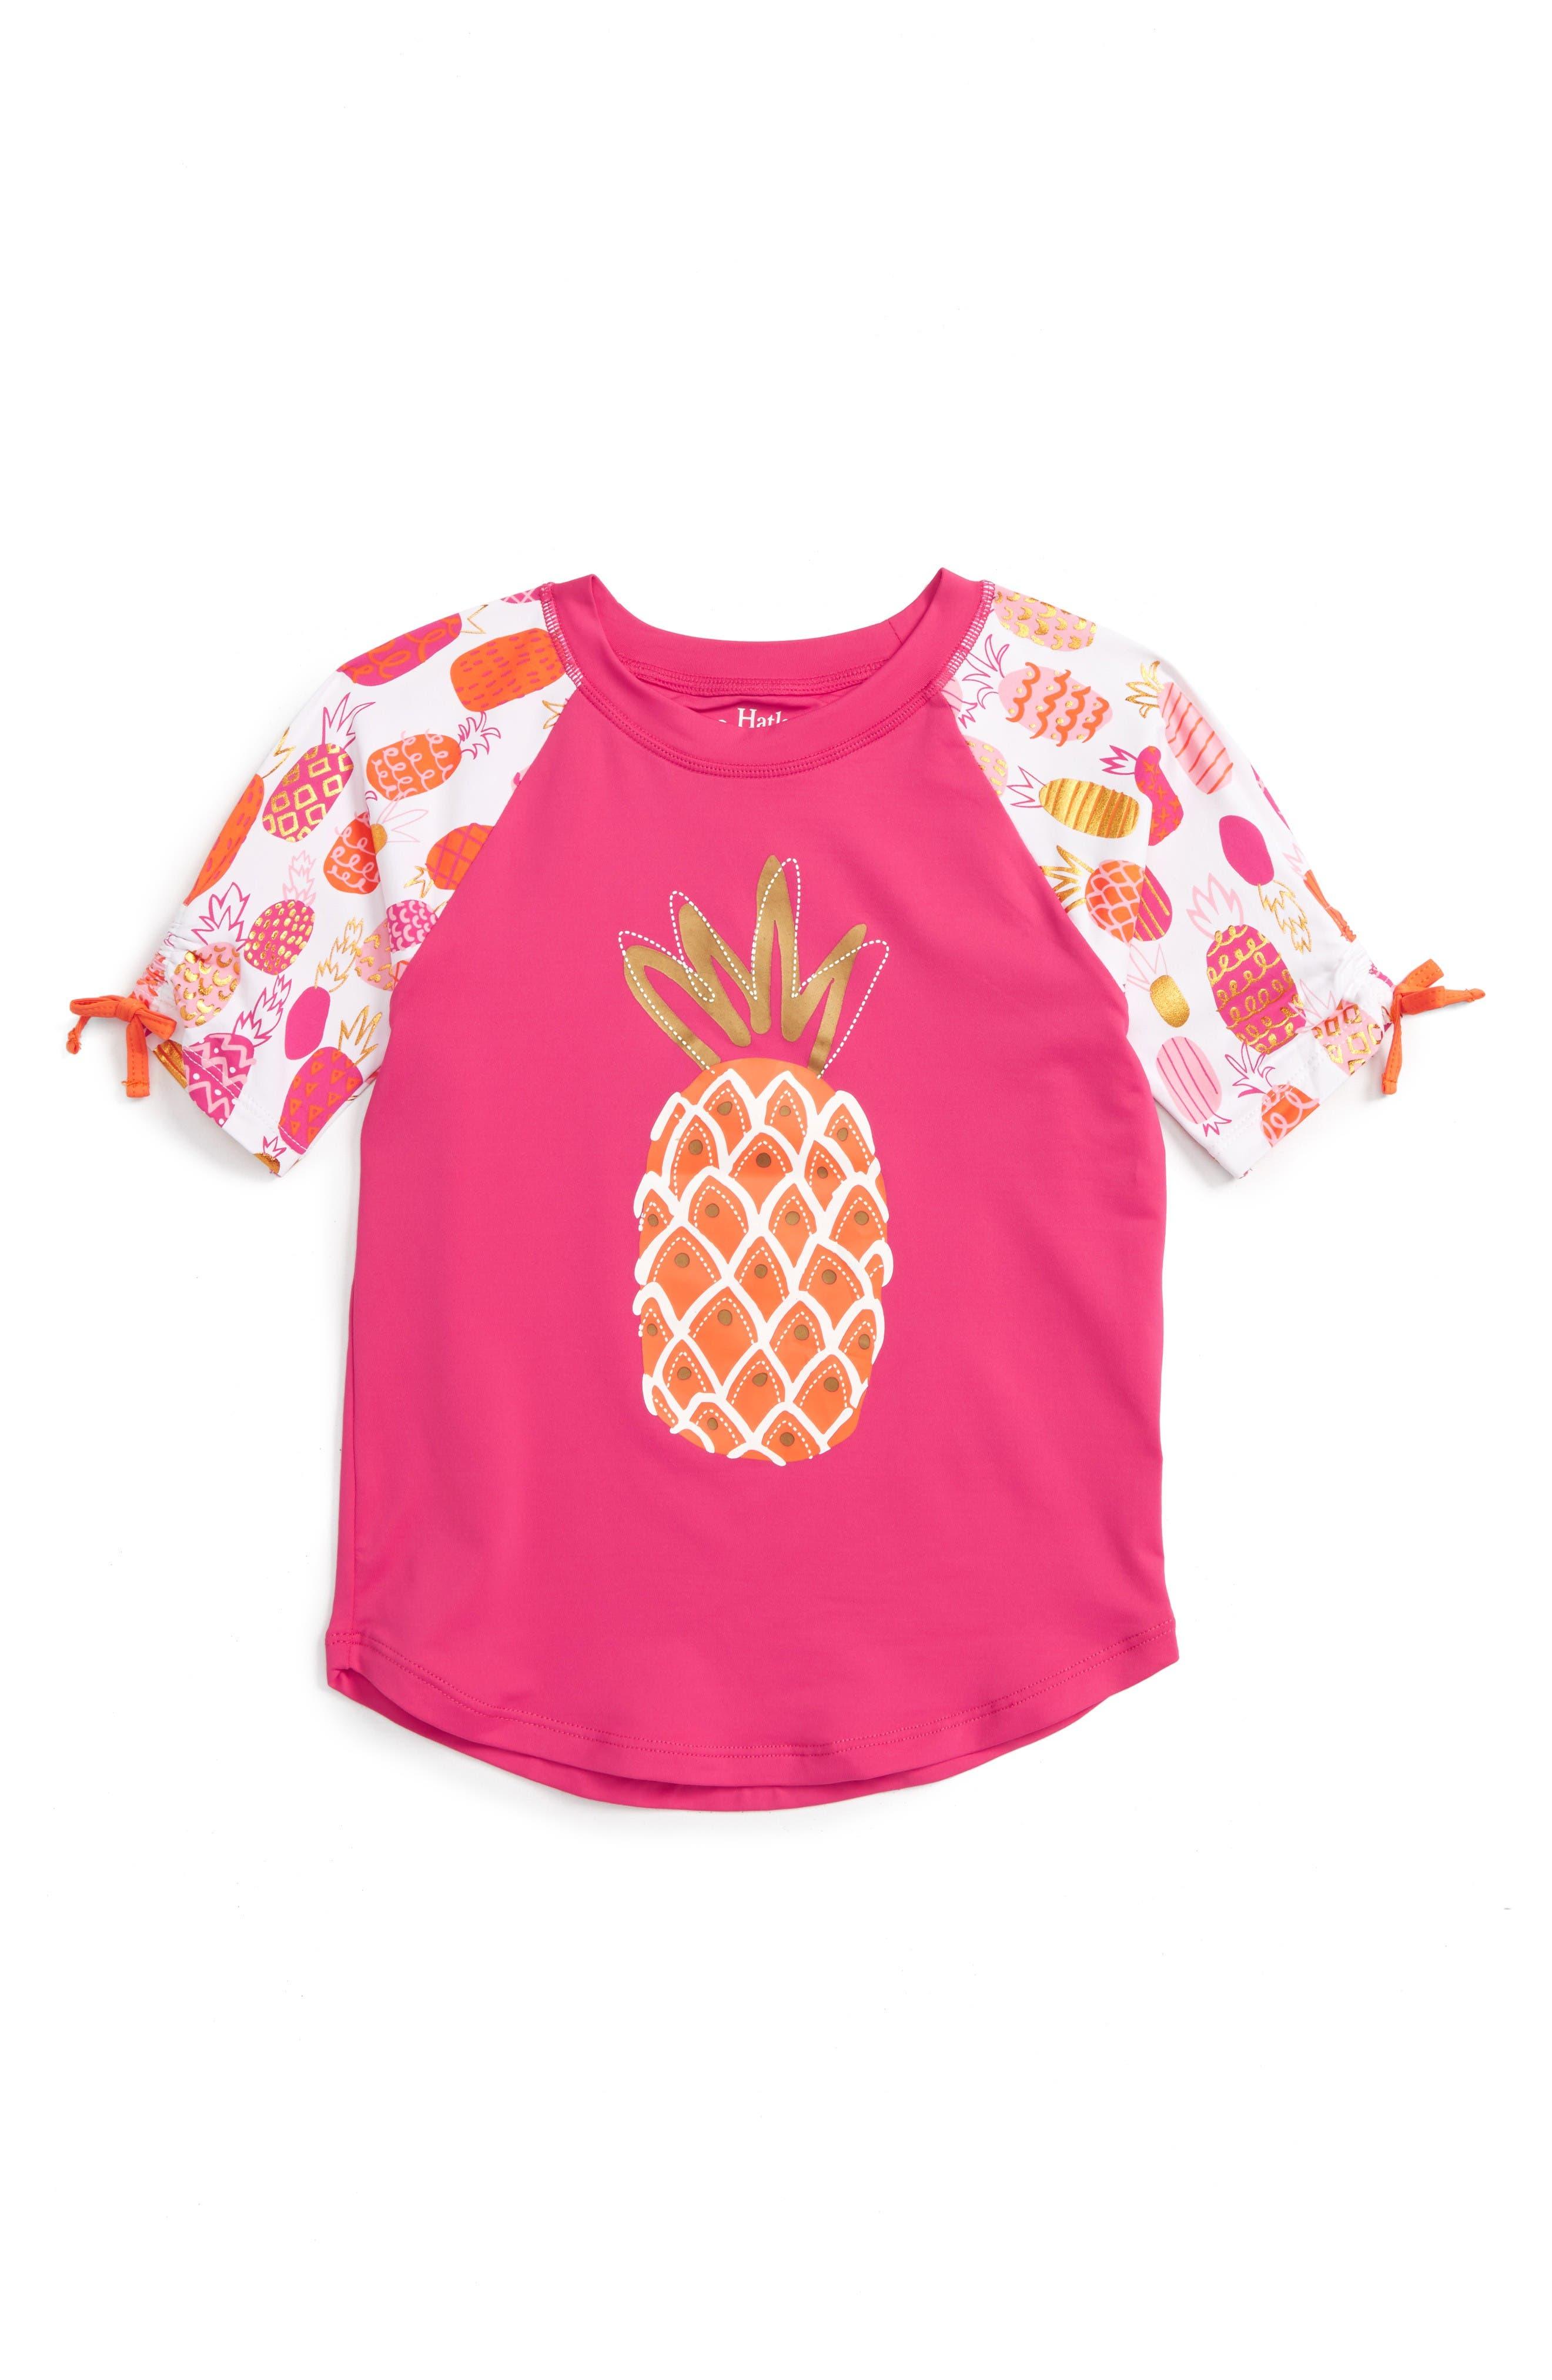 Alternate Image 1 Selected - Hatley Tropical Pineapple Rashguard (Toddler Girls, Little Girls & Big Girls)